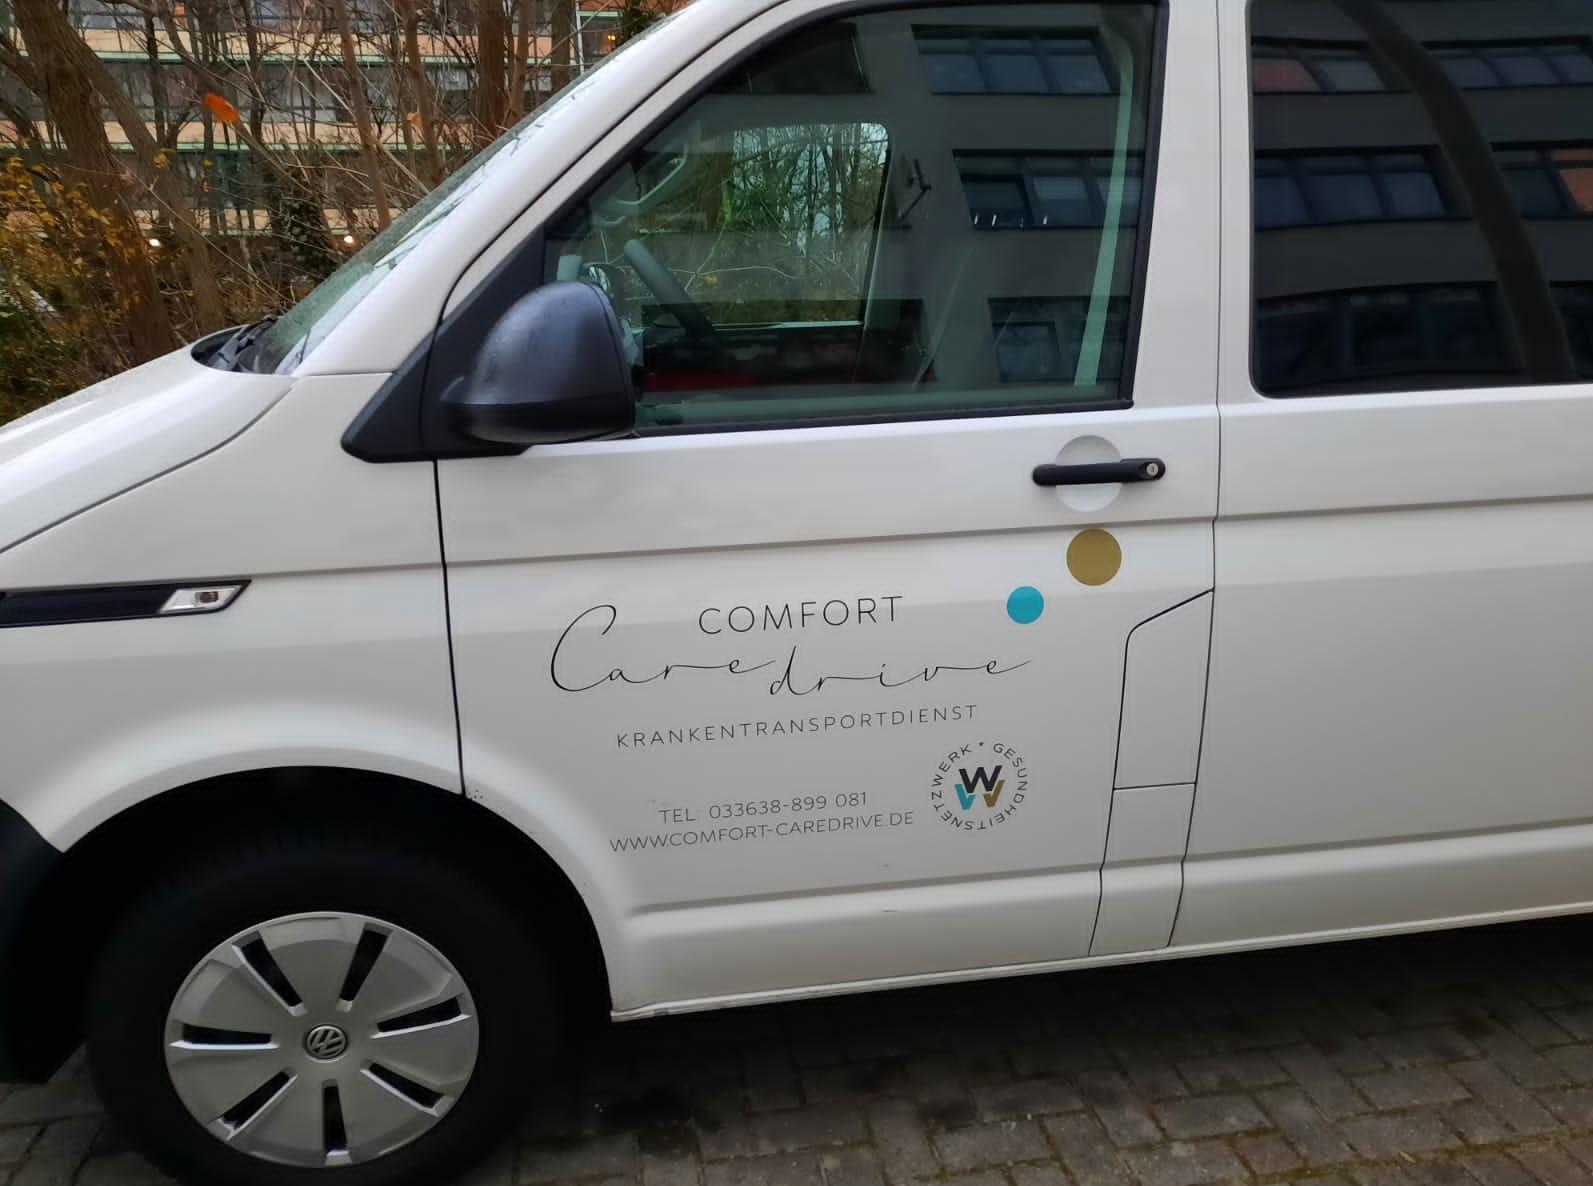 COMFORT Caredrive GmbH - Krankenfahrdienst